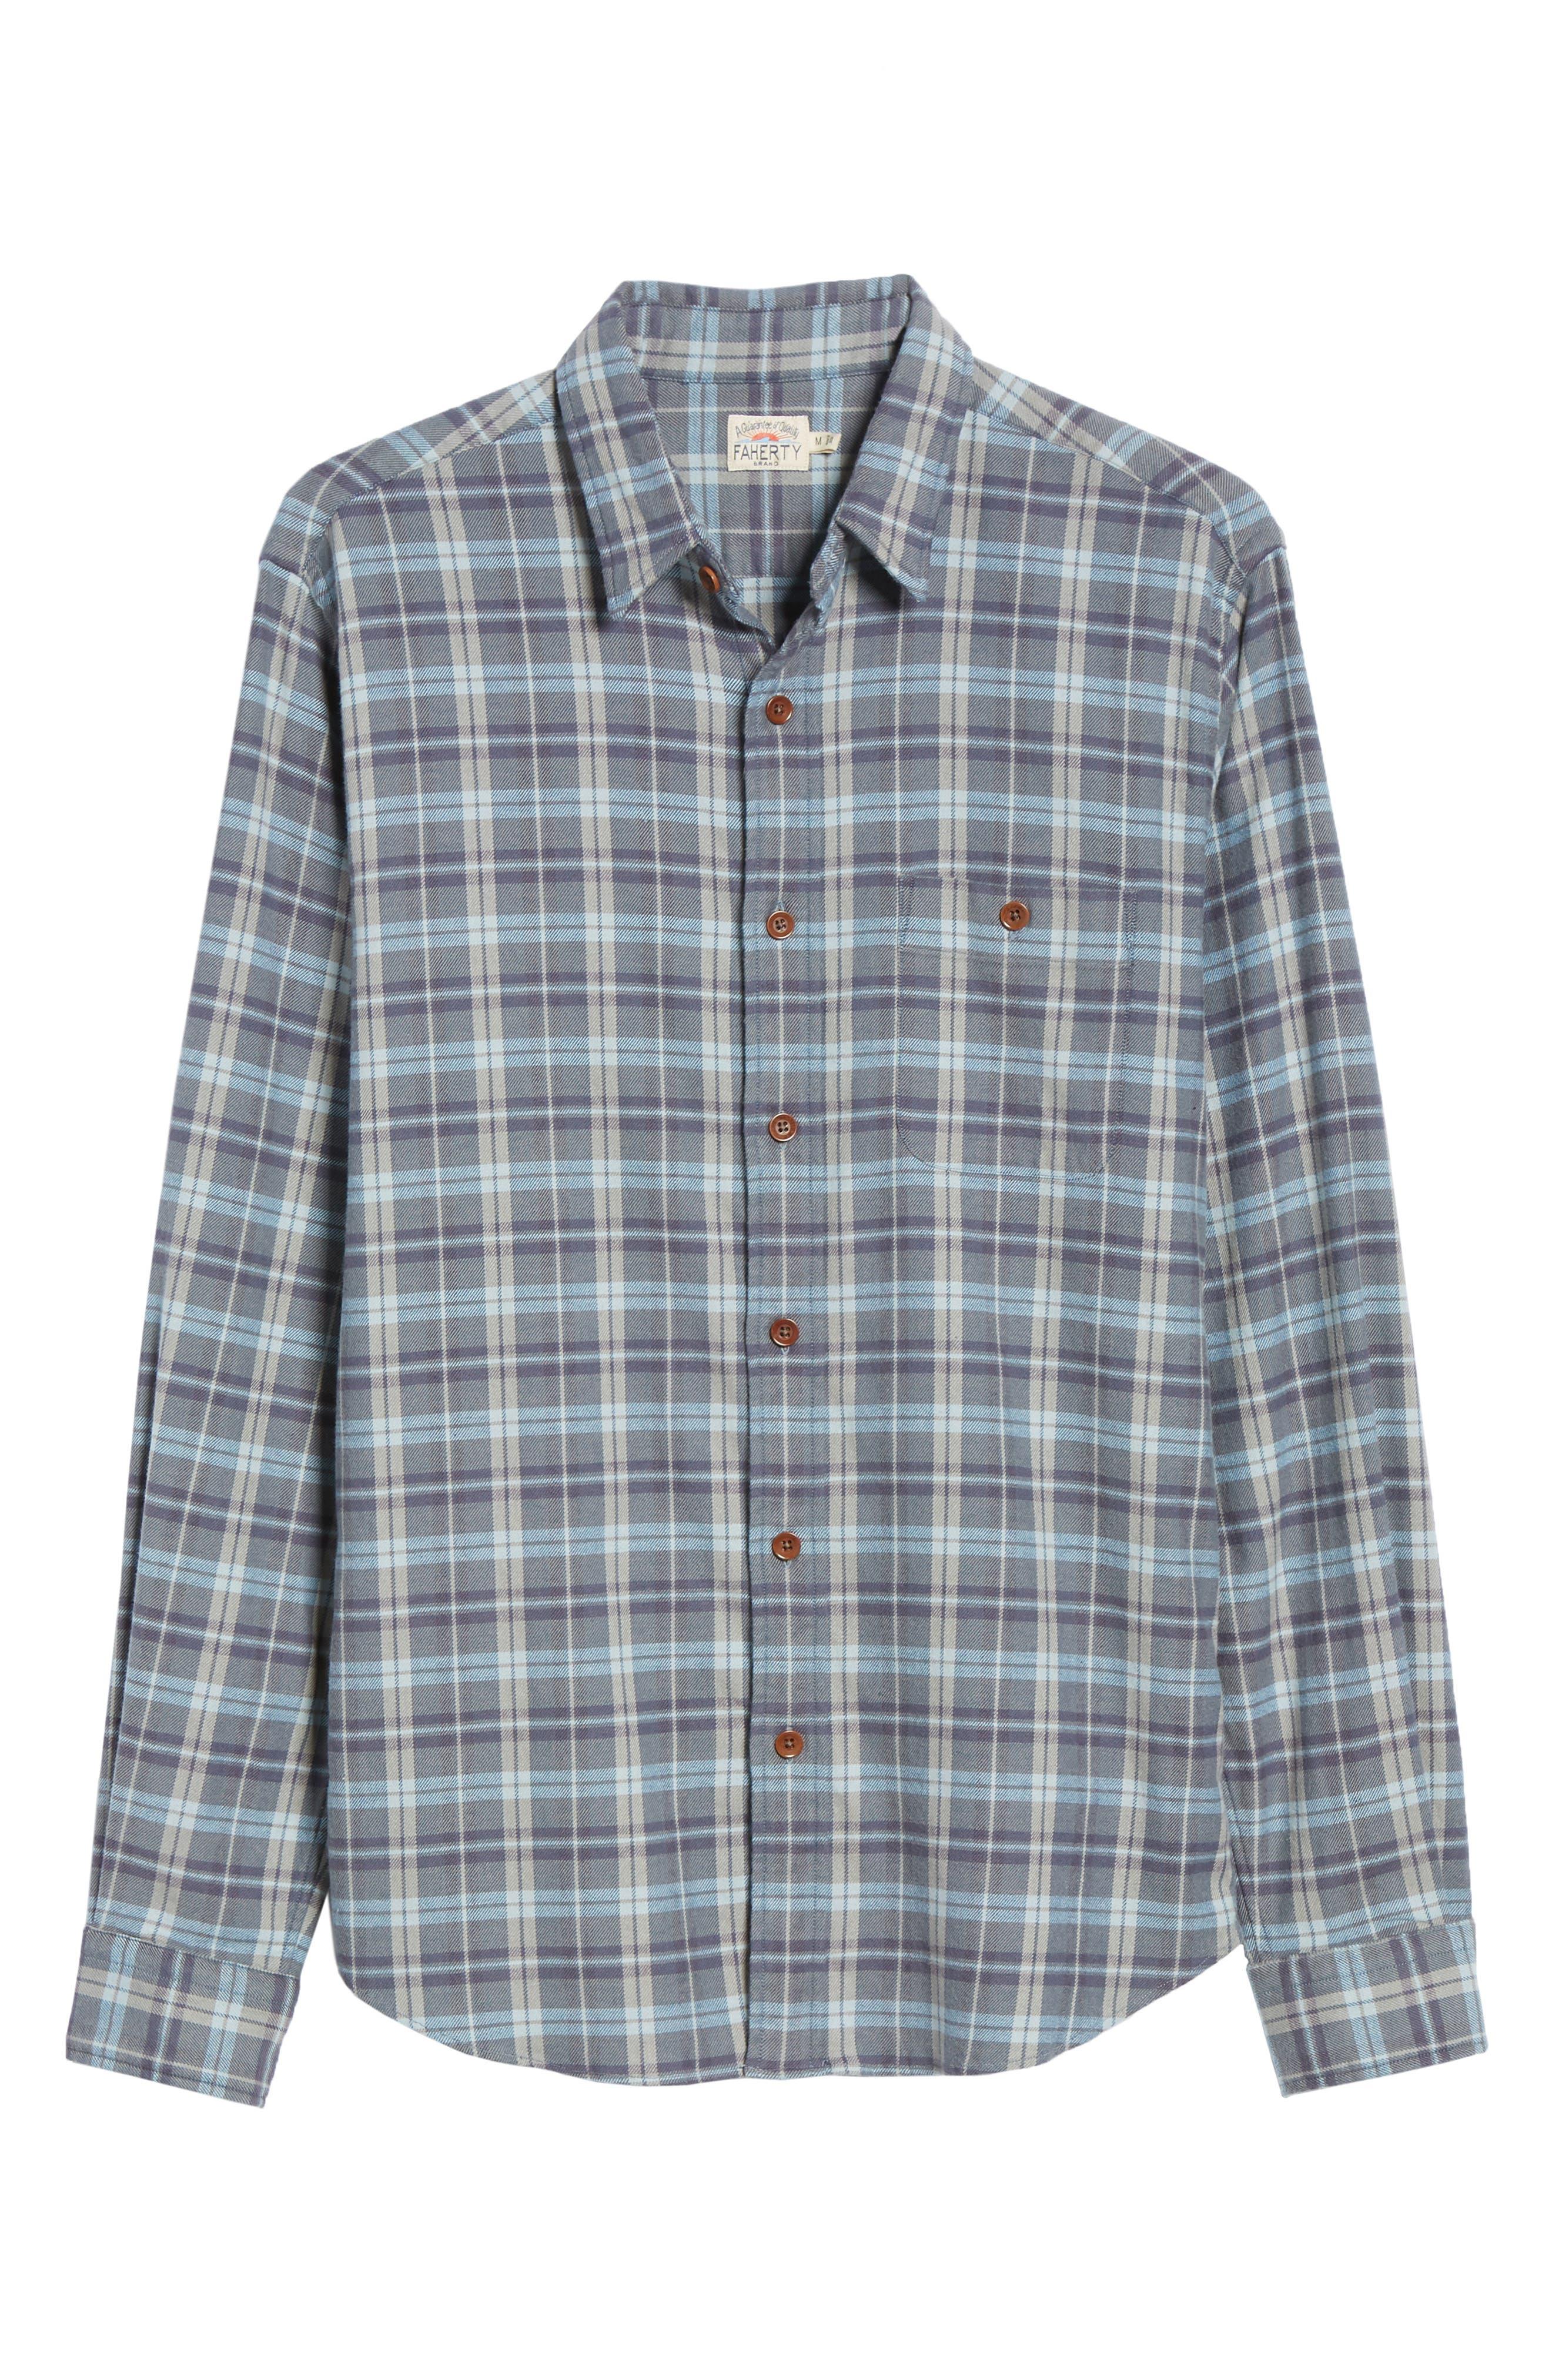 Seaview Stretch Flannel Shirt,                             Alternate thumbnail 5, color,                             DARK BLUE GREY